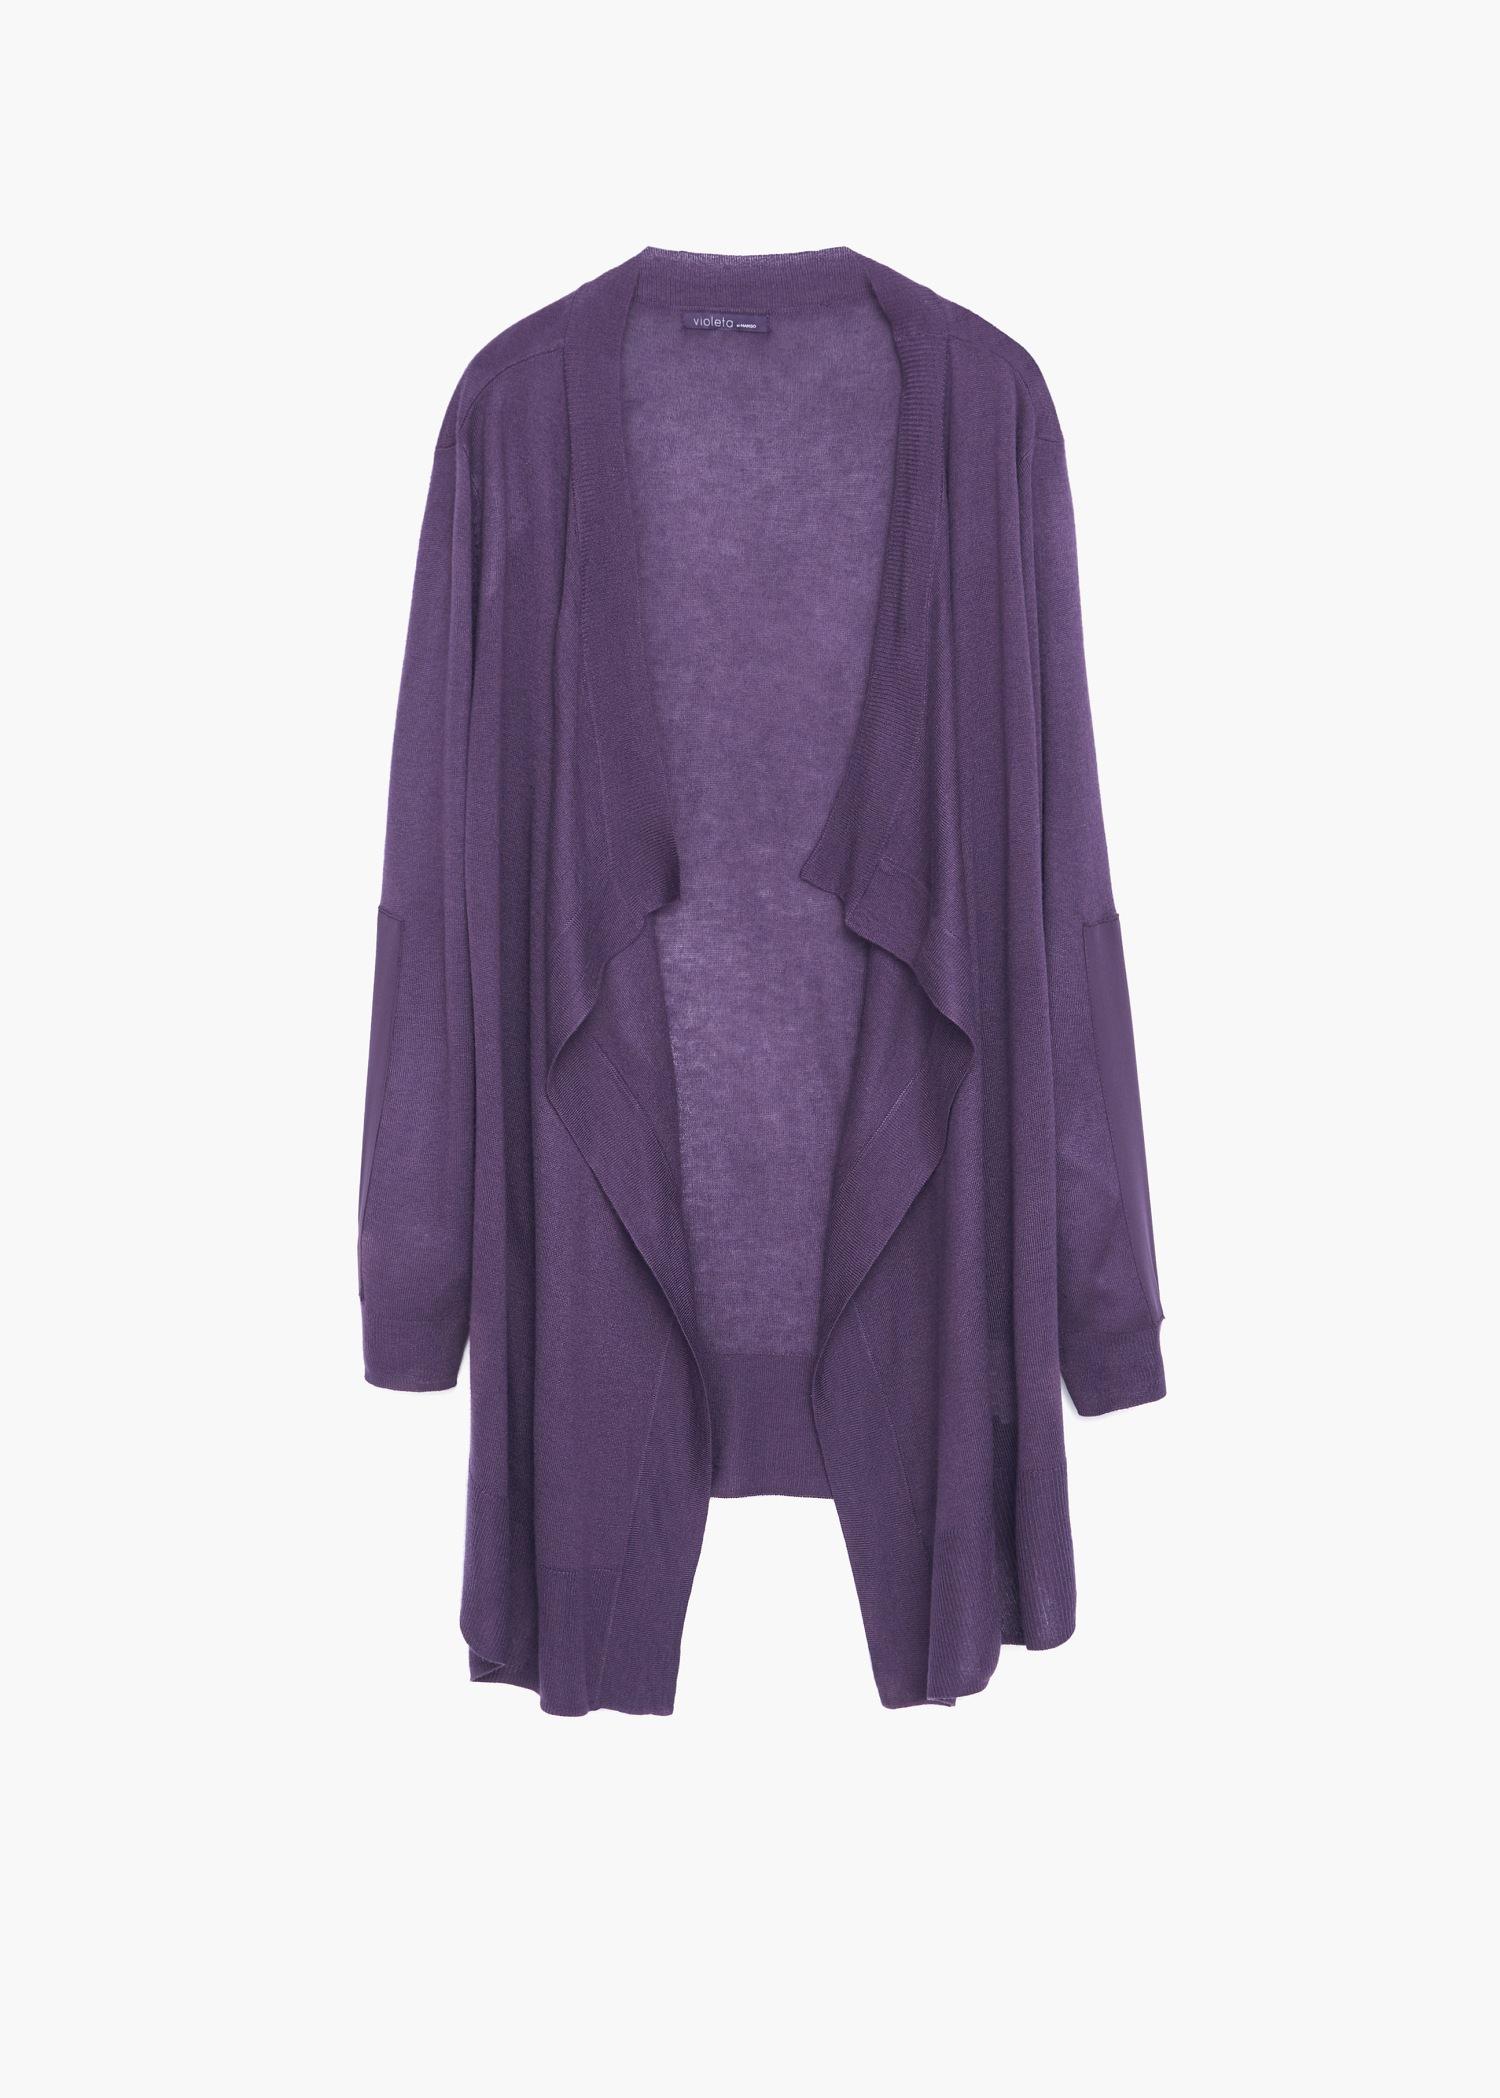 Violeta by mango Waterfall Wool-blend Cardigan in Purple | Lyst